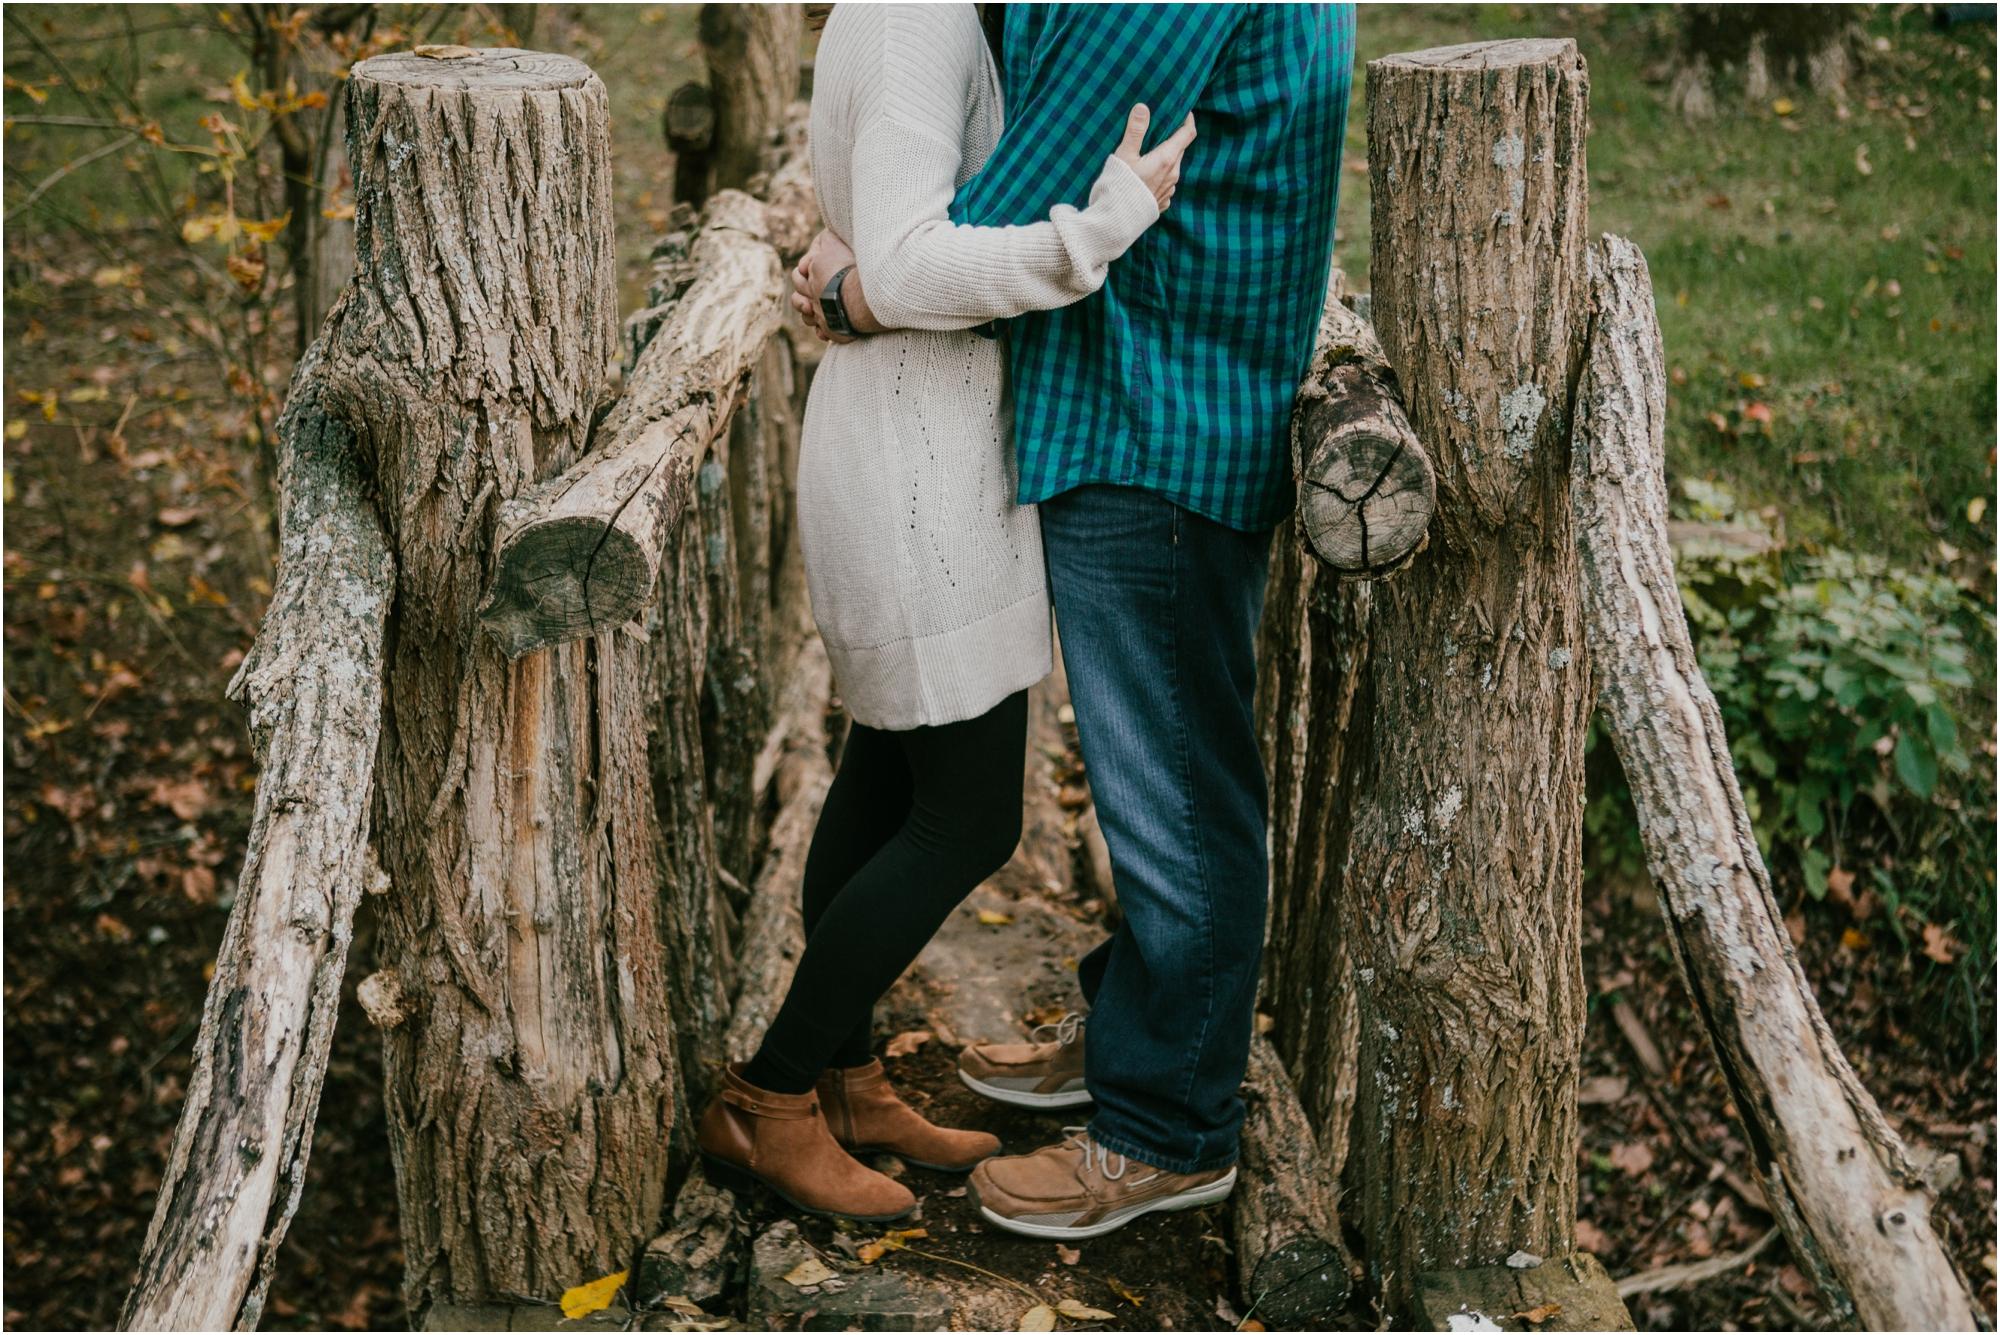 katy-sergent-millstone-limestone-tn-rustic-fall-engagement-session-adventurous-outdoors-intimate-elopement-wedding-northeast-johnson-city-photographer_0019.jpg